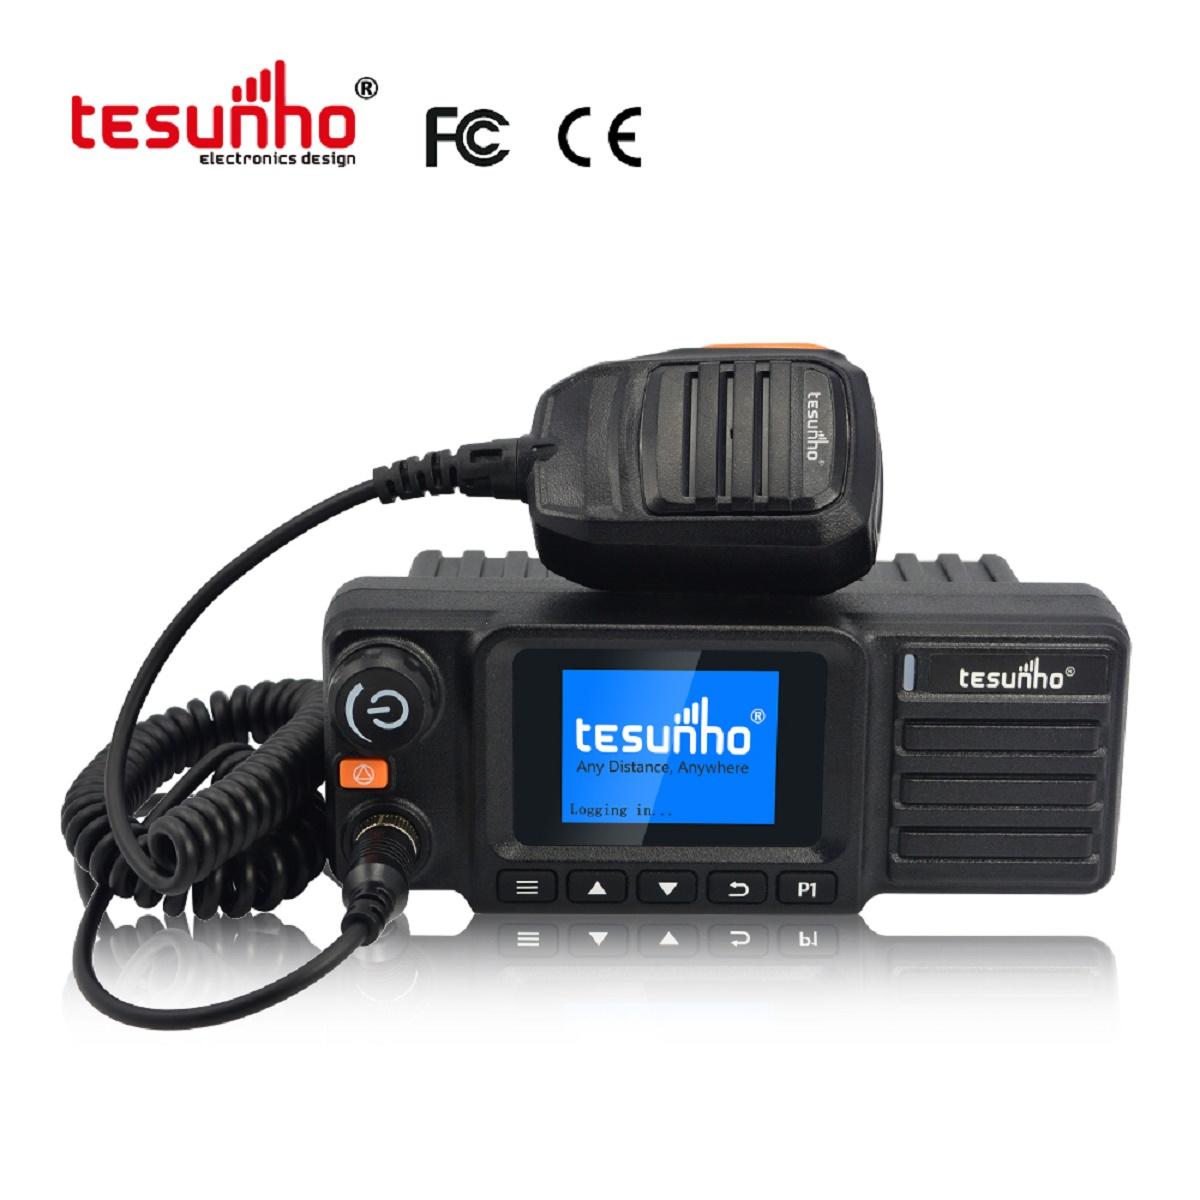 UHF IP POC Combined Mobile Radio 4G Walkie Talkie With GPS TM-990